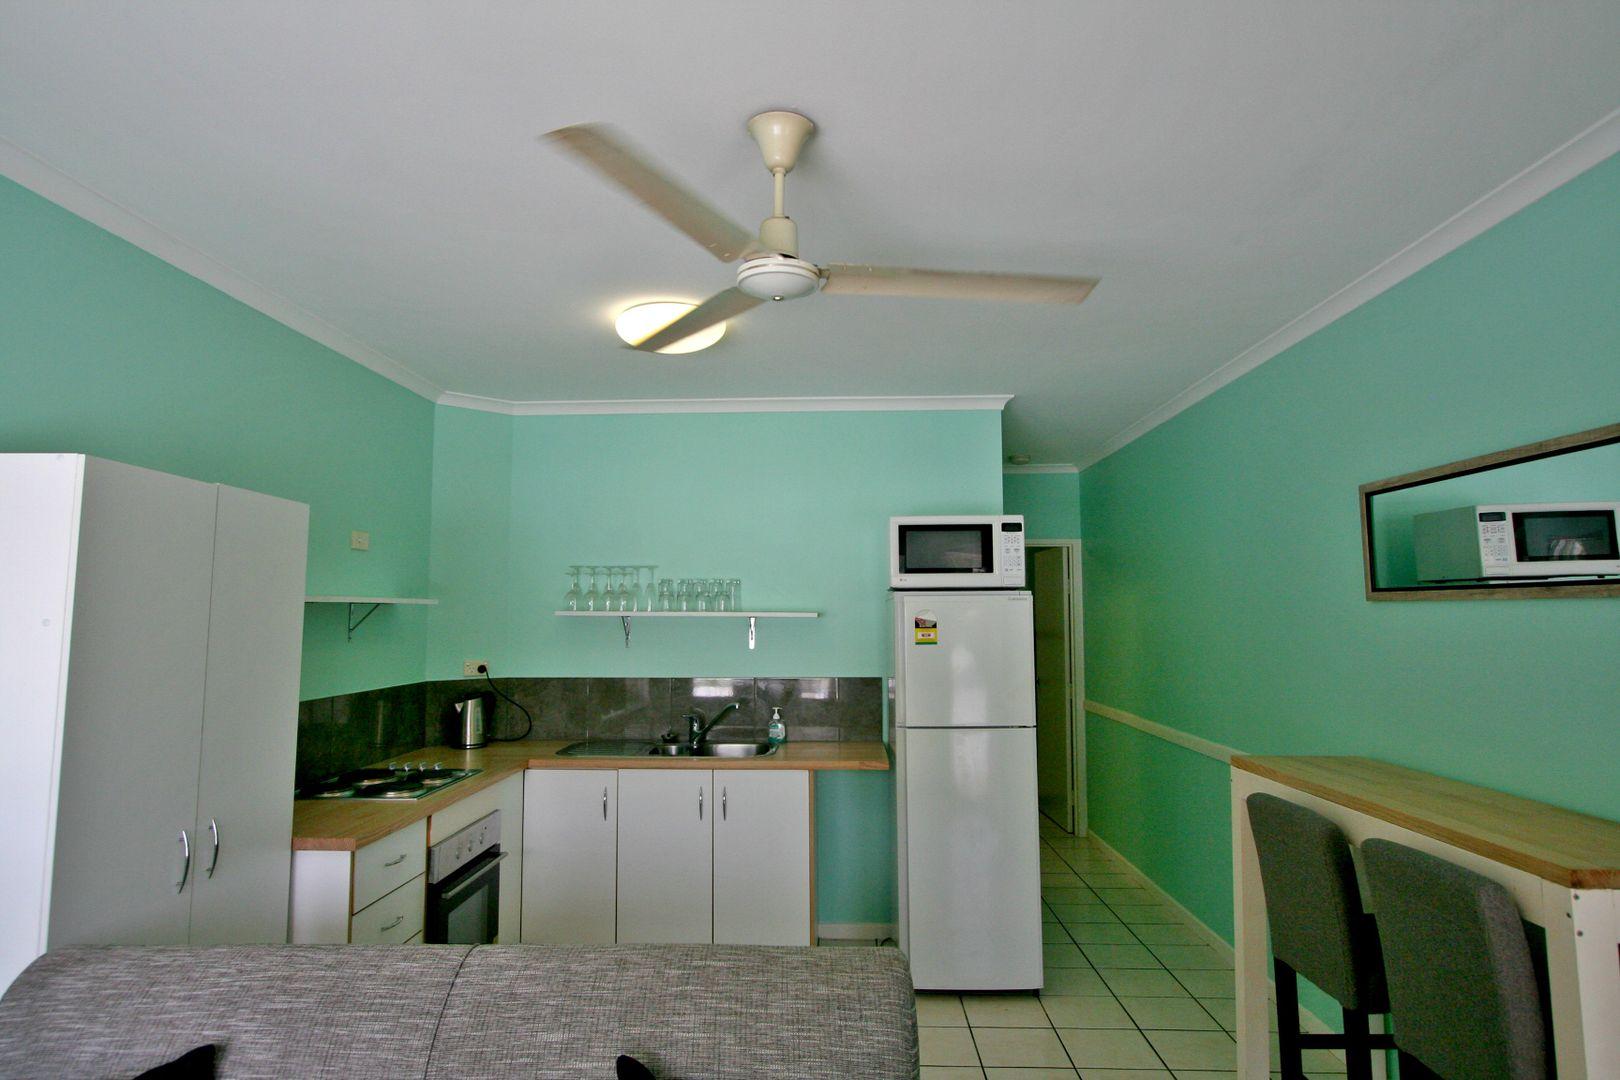 21/1 Beor St - Plantation Resort, Port Douglas QLD 4877 ...